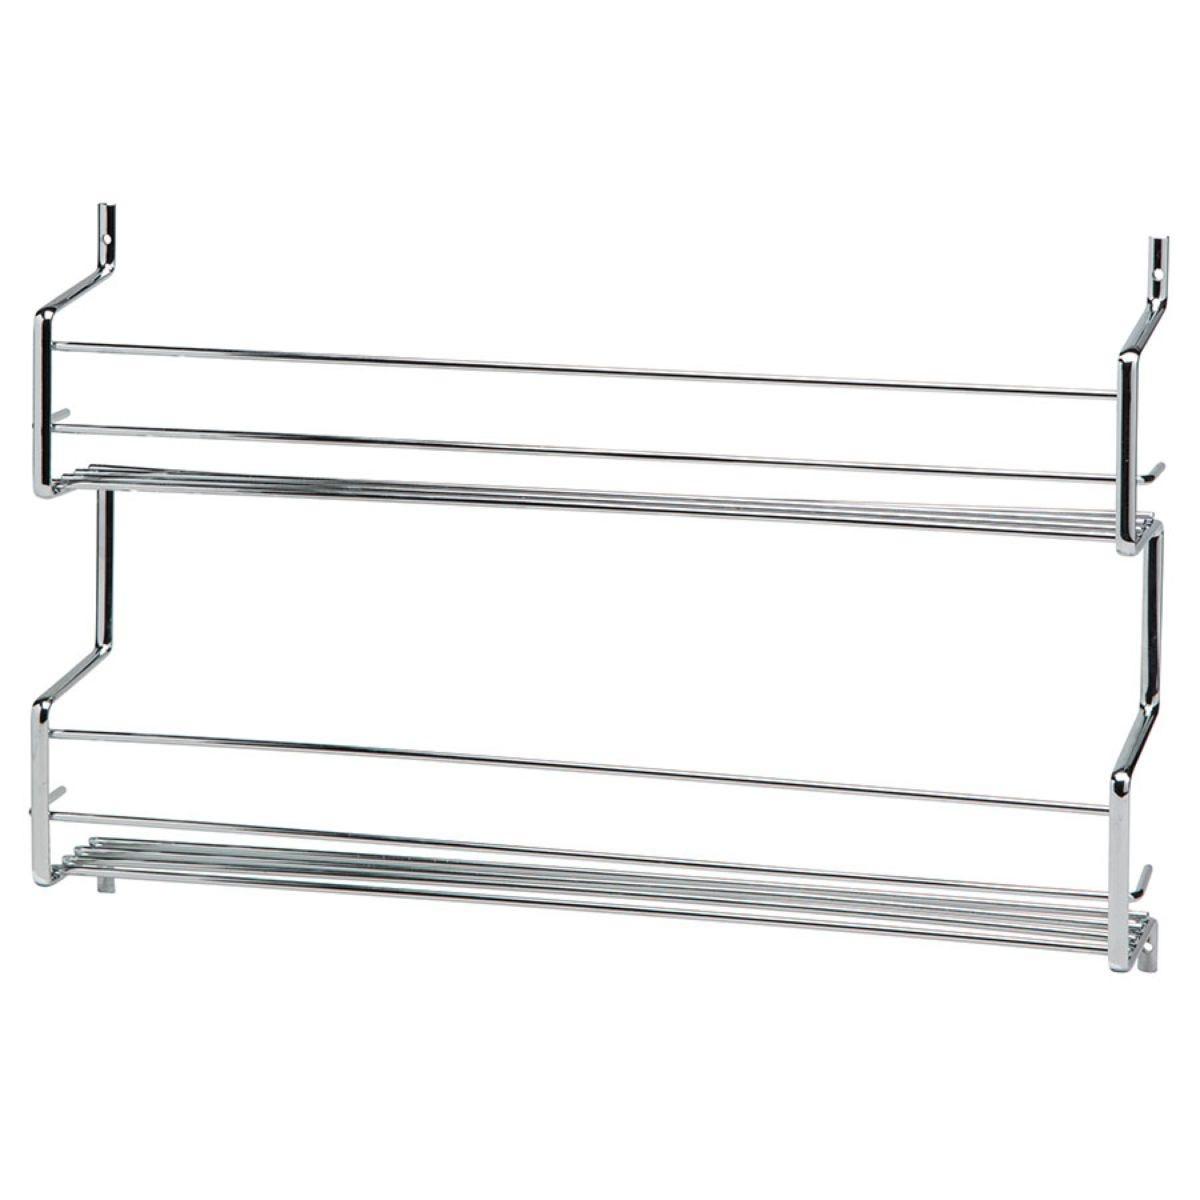 Hahn Metal Wall / Cupboard 2 Tier Spice Rack - Chrome